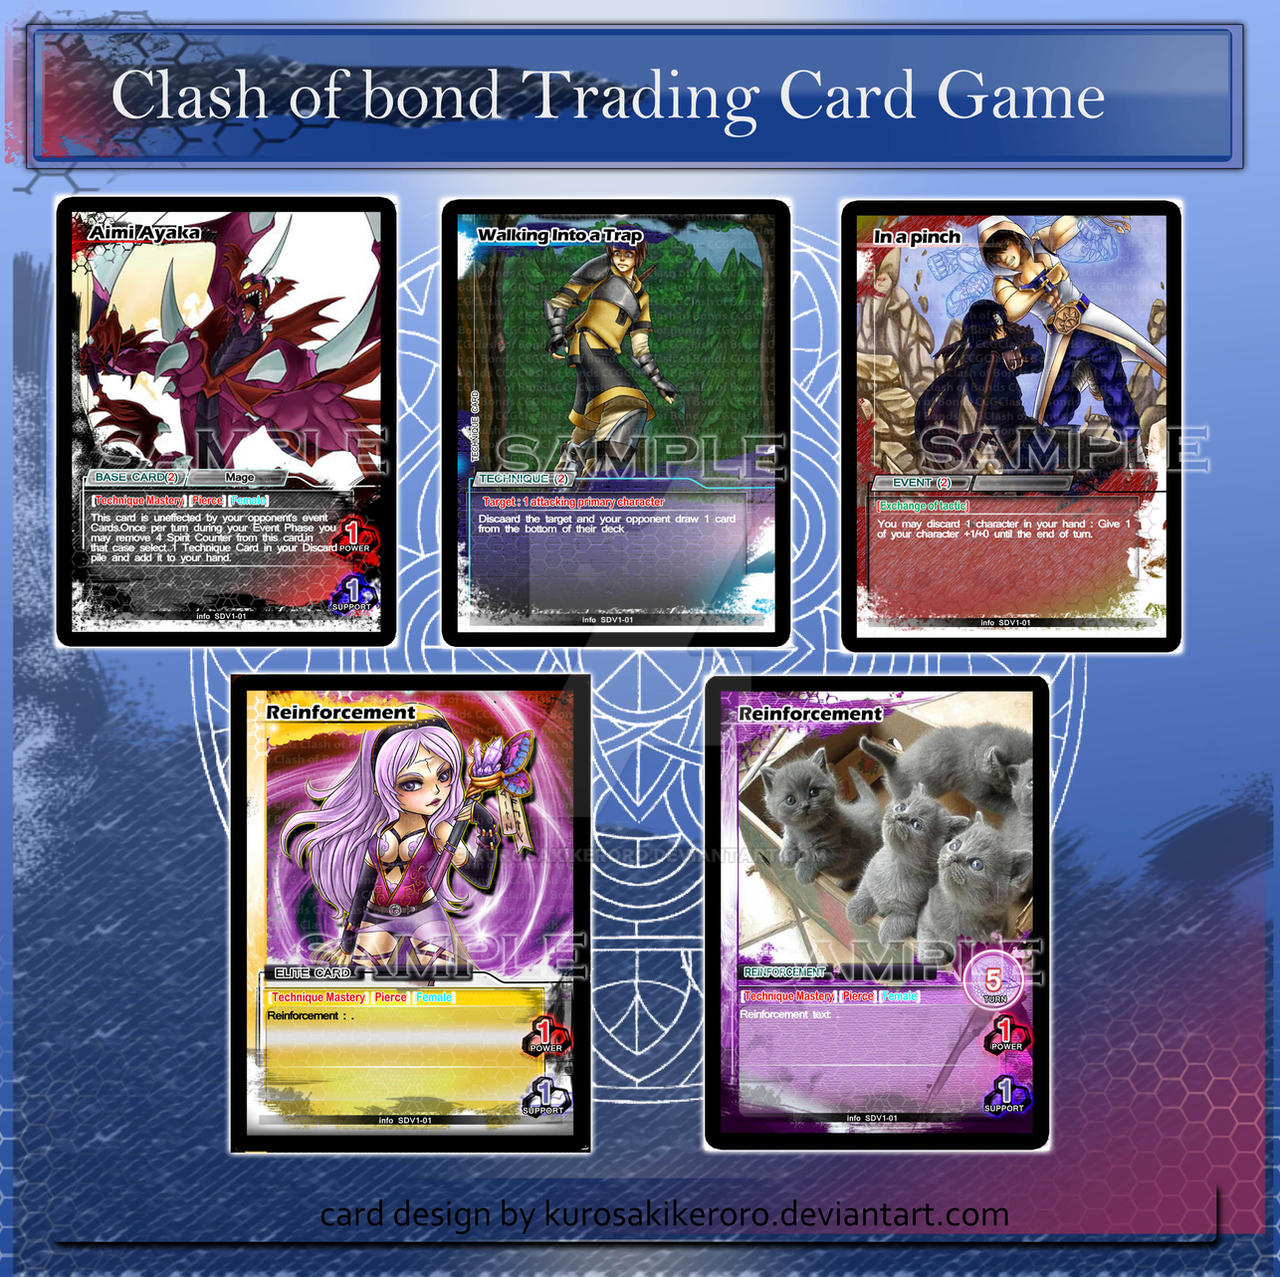 Clash of bond trading card design by KurosakiKeroro on DeviantArt